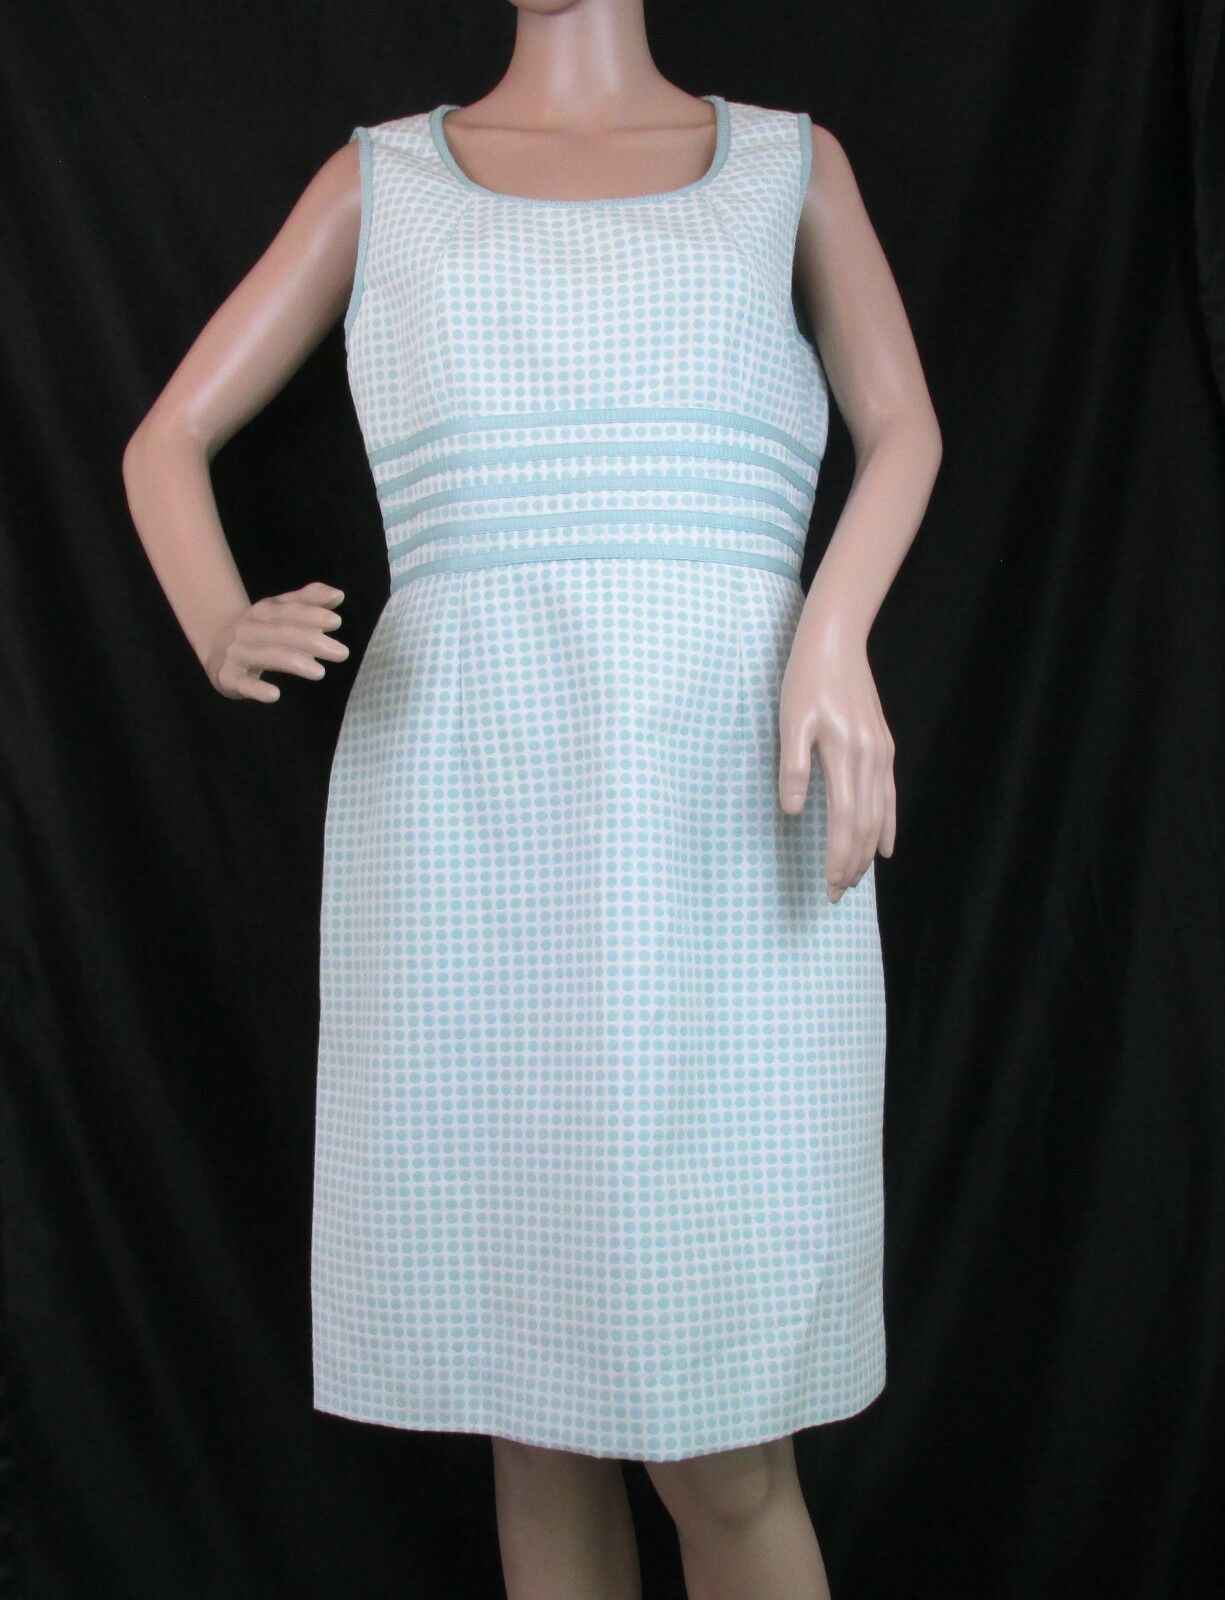 1c4d167c63a Antonio Melani 8 Aqua Polka Dots Sheath Dress Sleeveless Lined Career  Classic